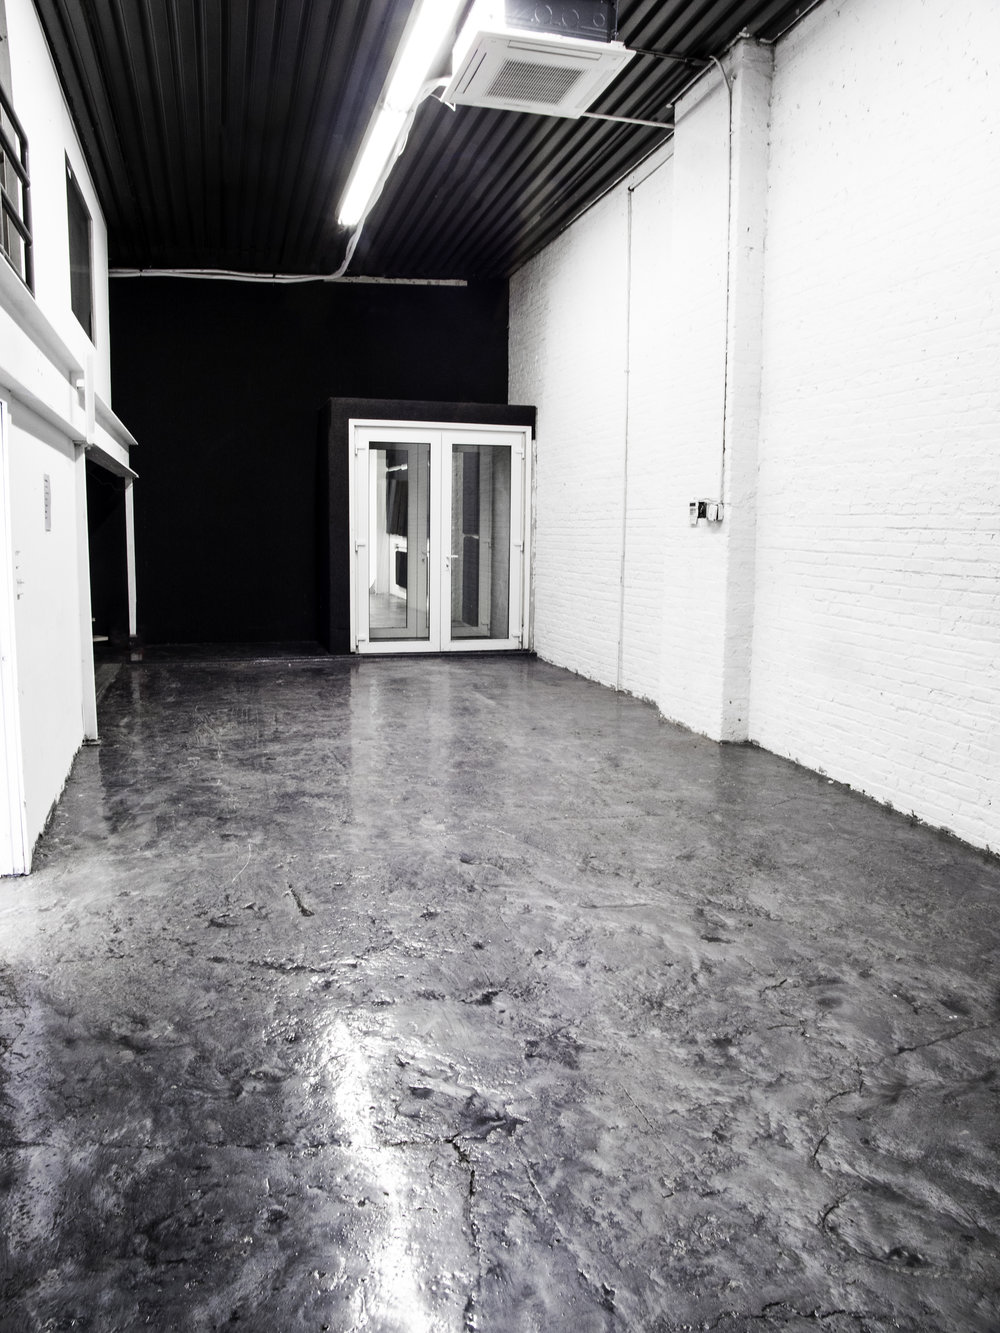 sound-stage-cyclorama-studio-nyc.jpg